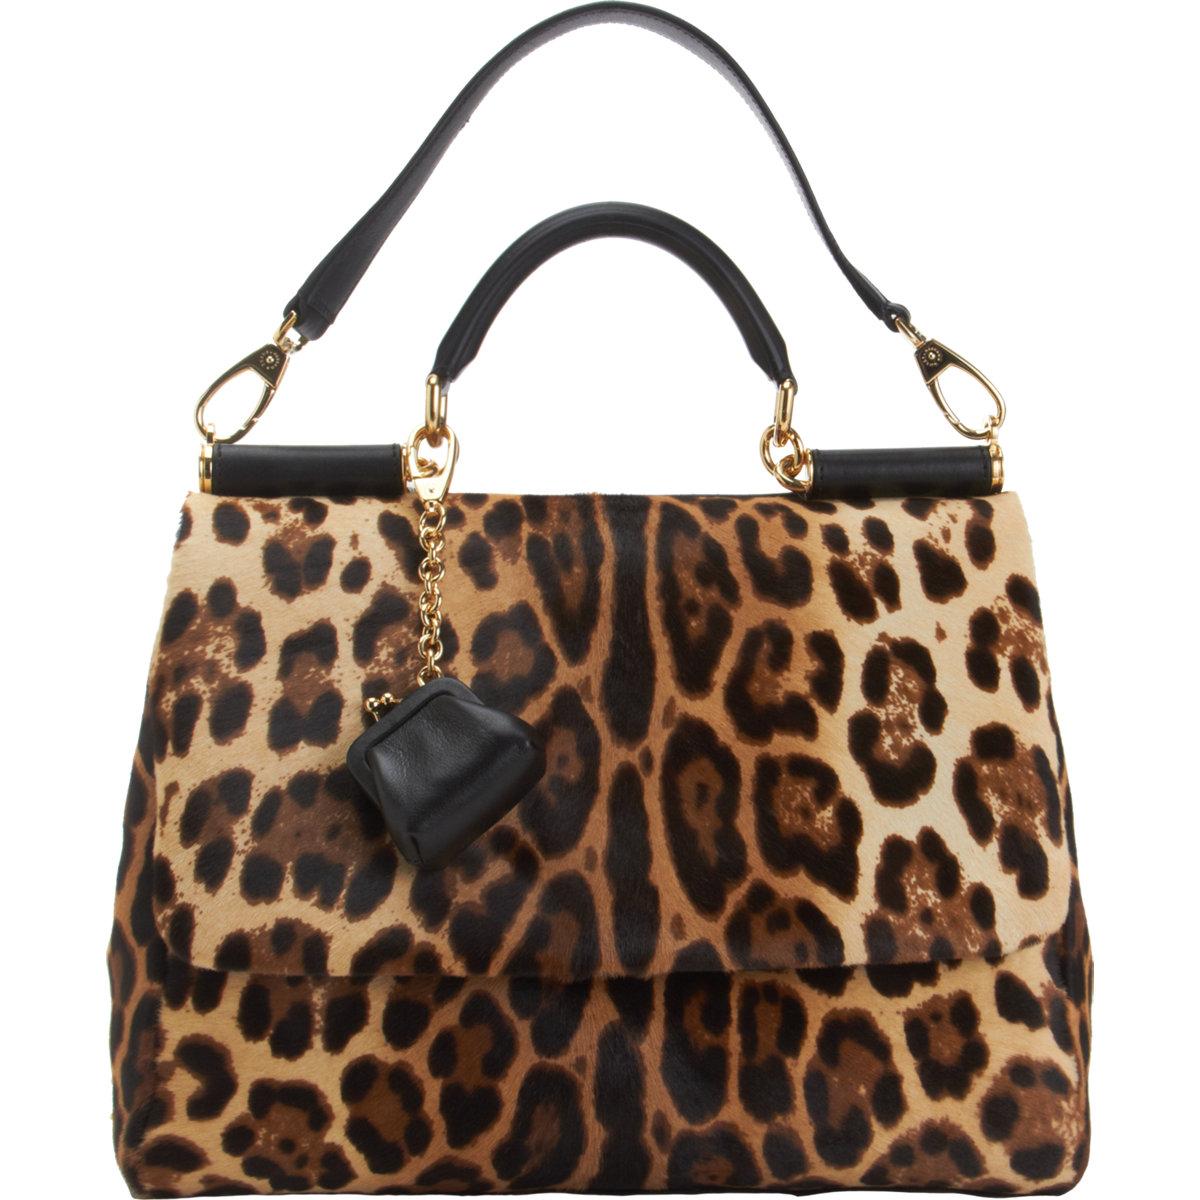 DOLCE & GABBANA Calf Hair Miss Sicily Bag $2,945